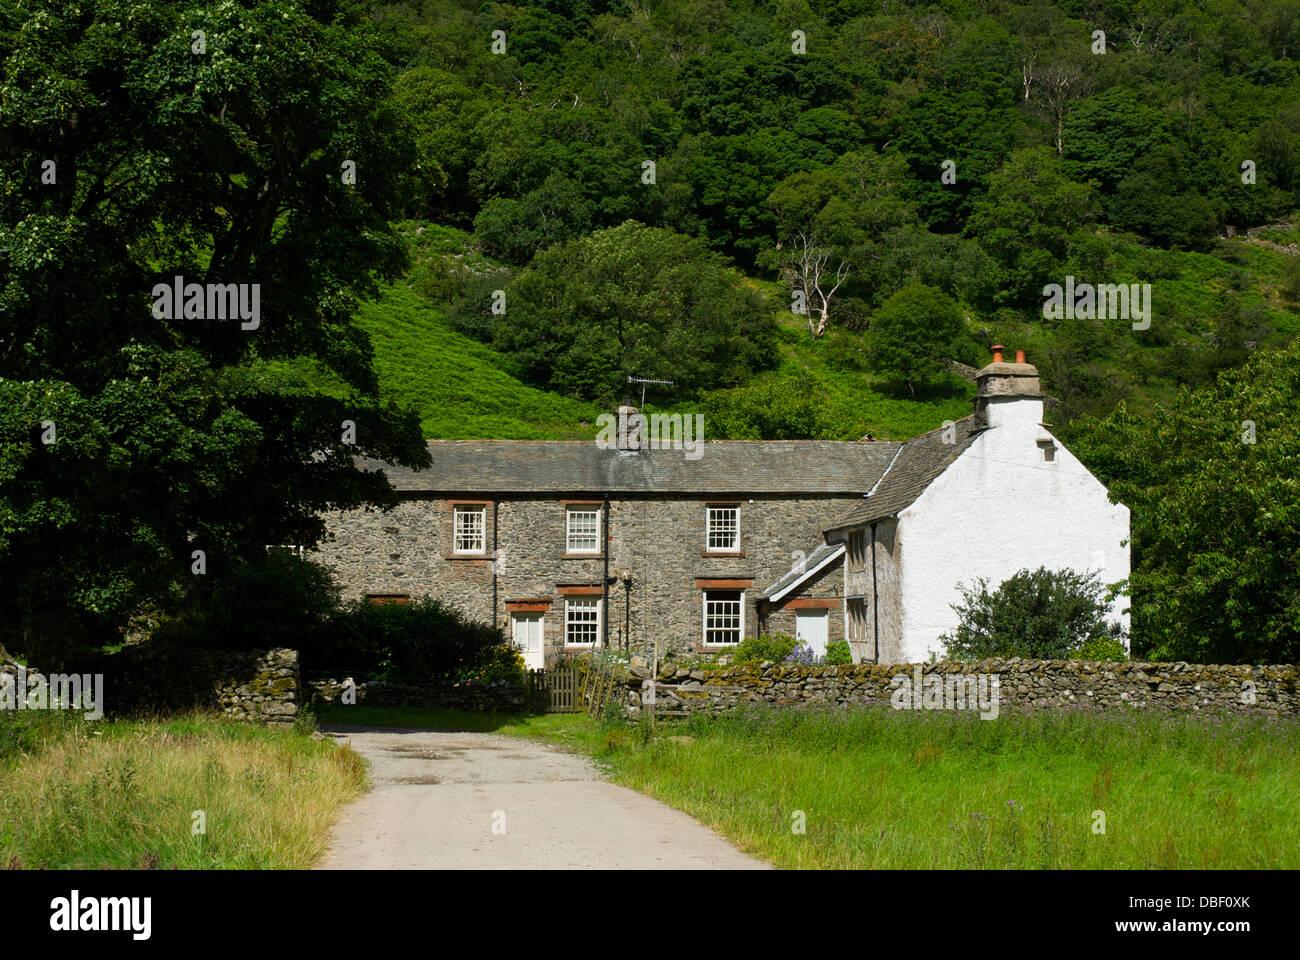 Hartsop Hall, a farmhouse near Brotherswater, Lake District National Park, Cumbria, England UK - Stock Image